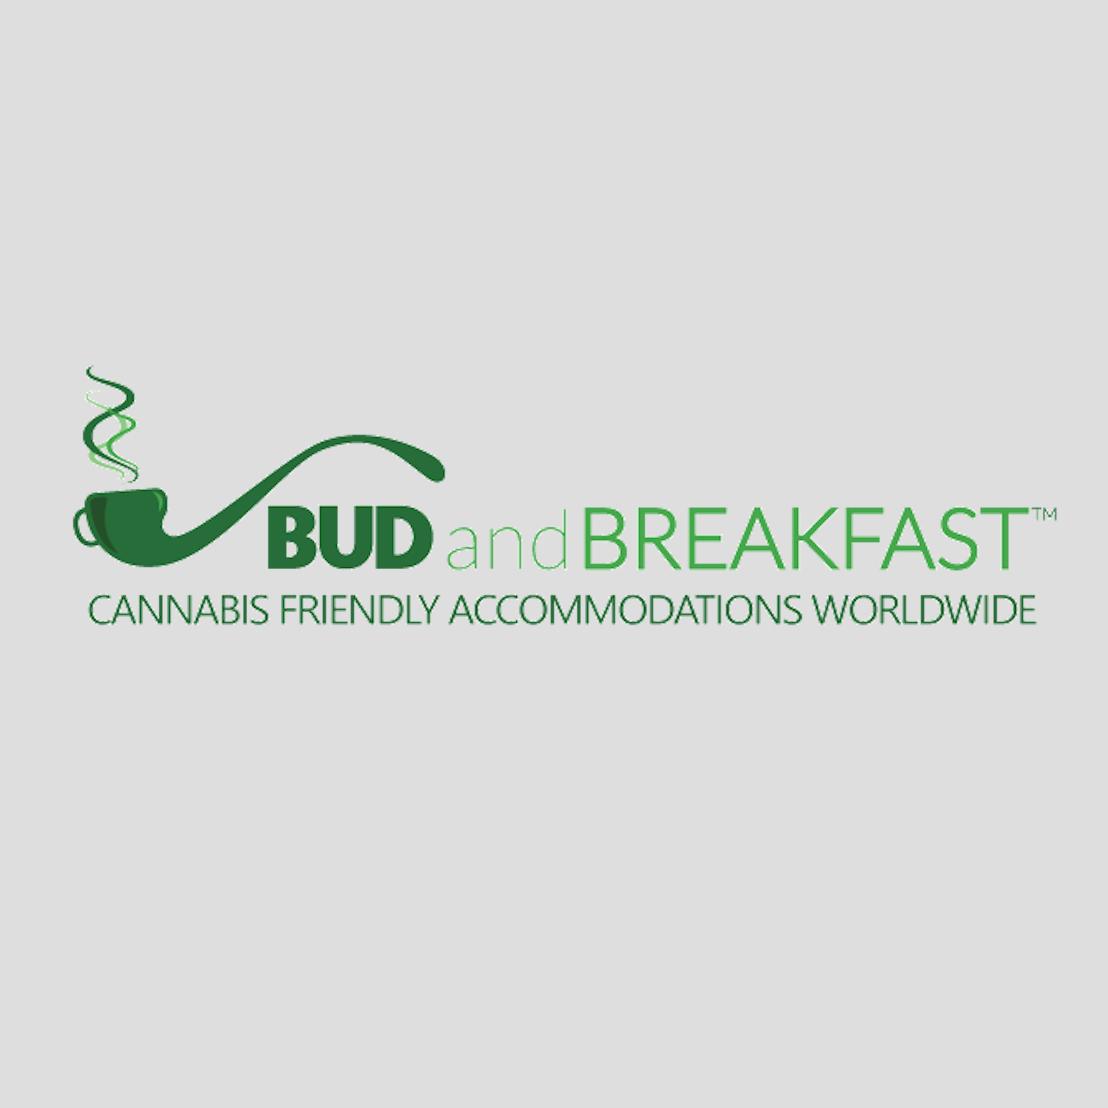 Bud and Breakfast logo